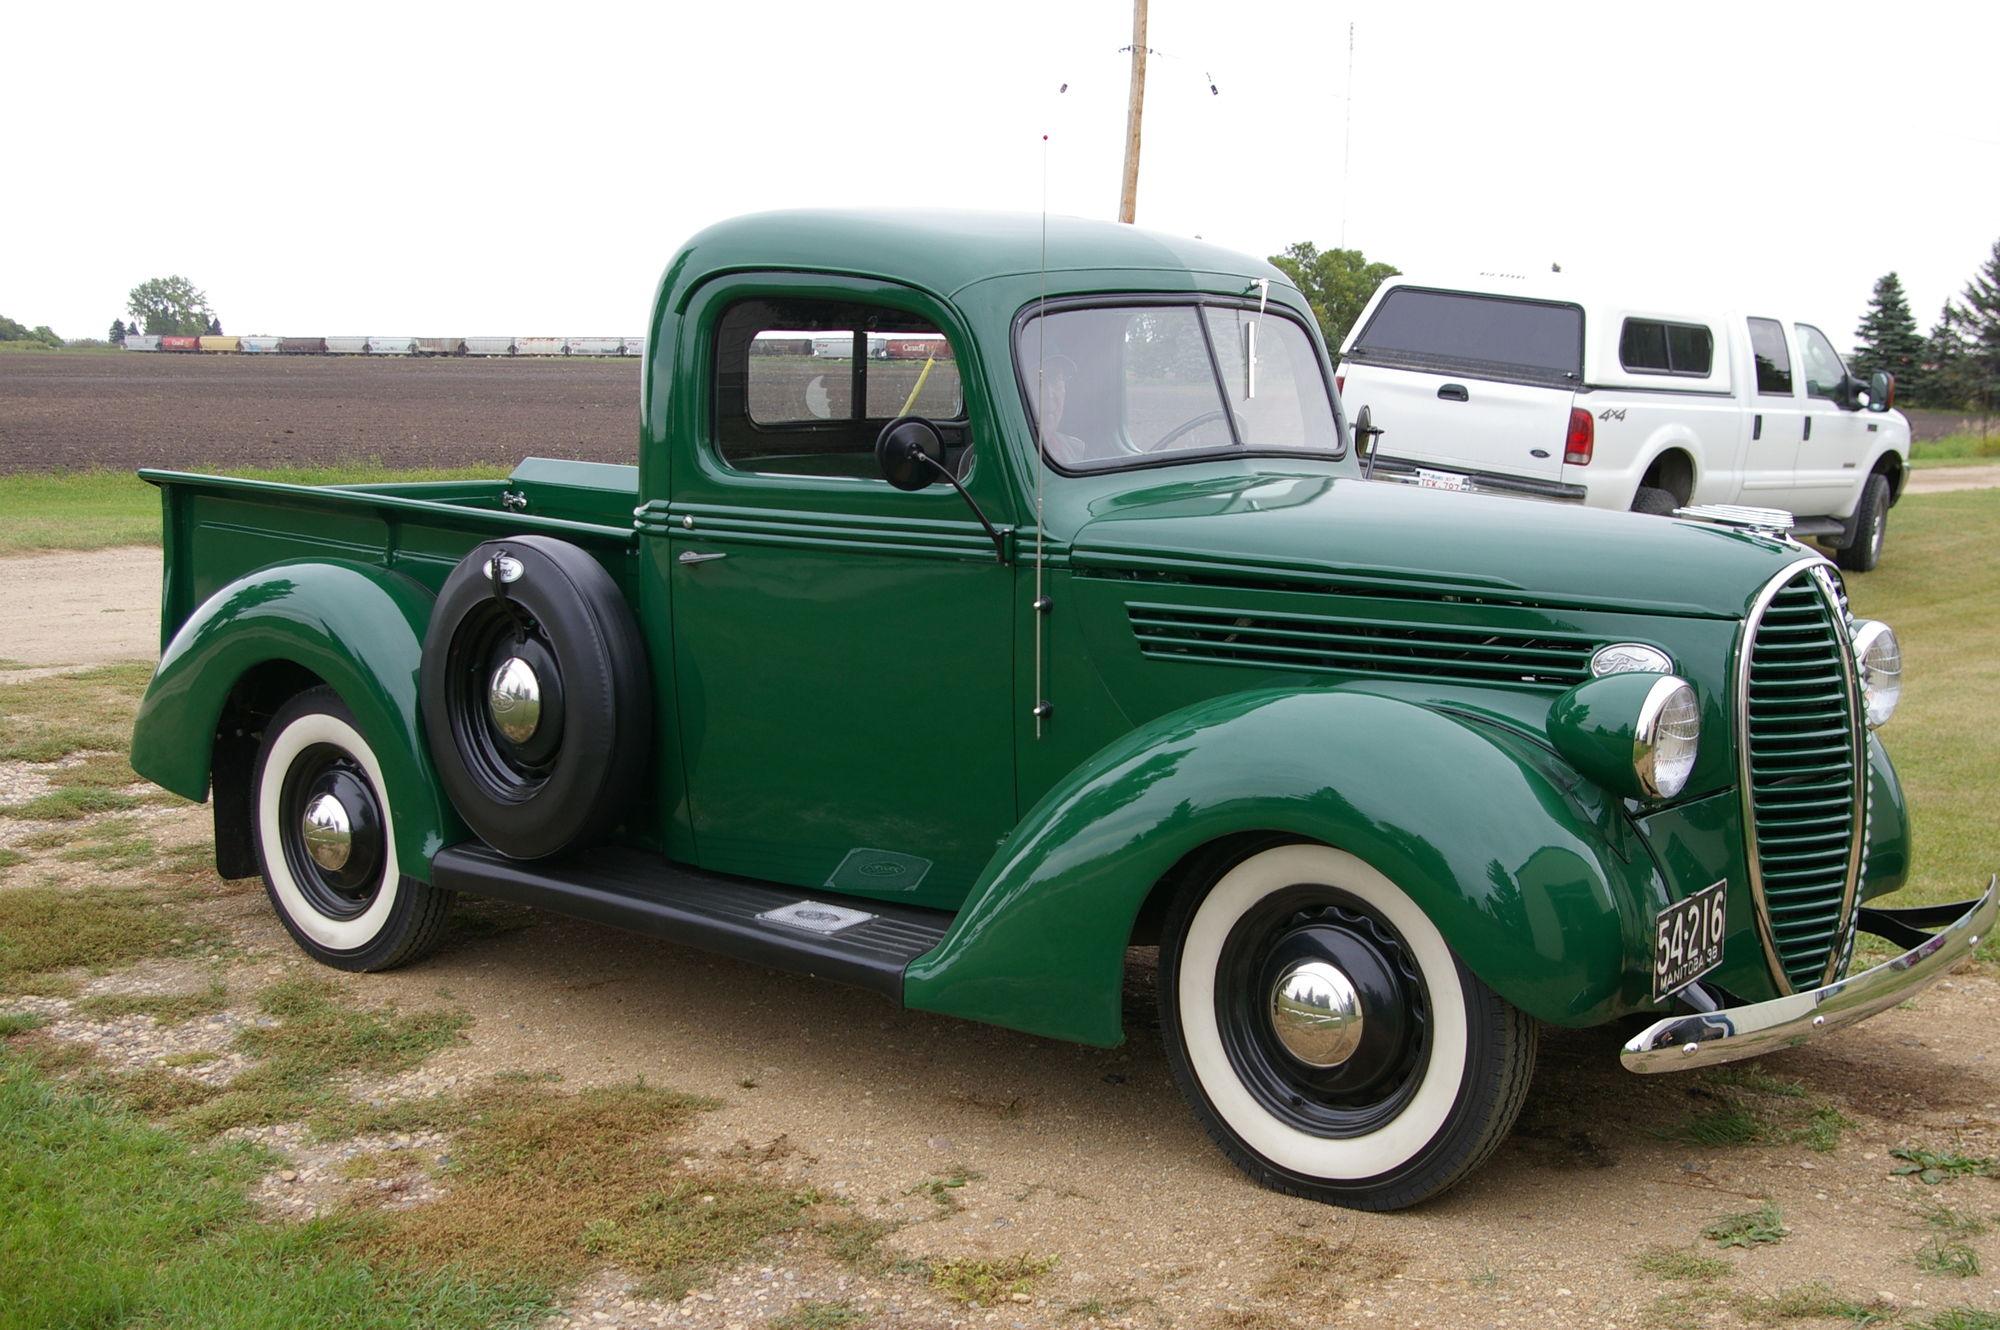 cheap trucks forsale under 1000 dollors in thomson ga autos post. Black Bedroom Furniture Sets. Home Design Ideas